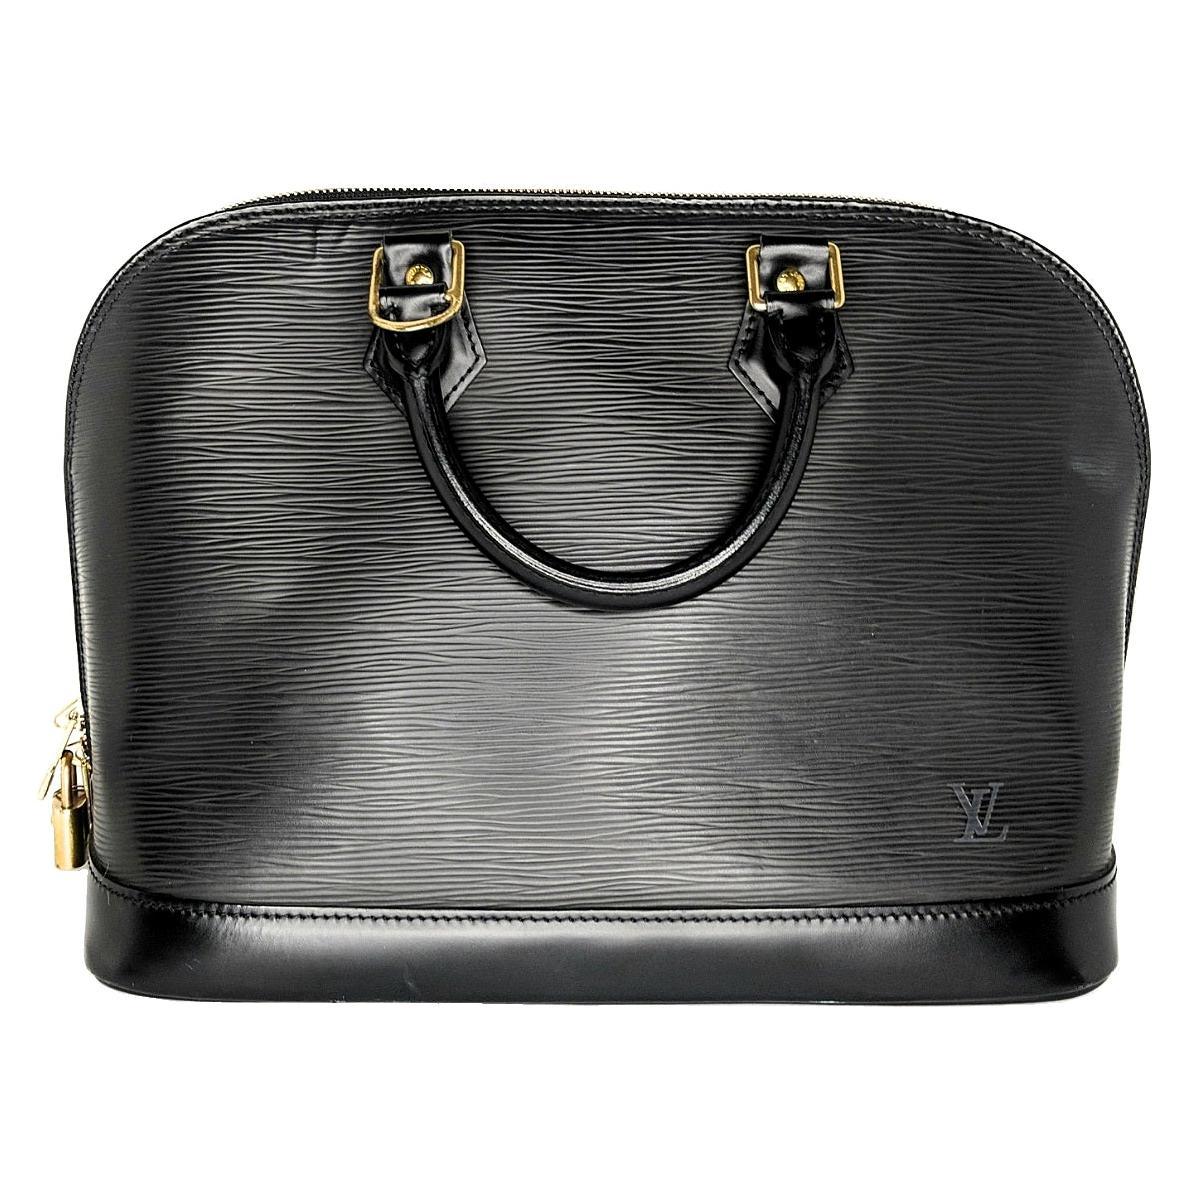 Louis Vuitton Black EPI Alma PM Handbag Satchel